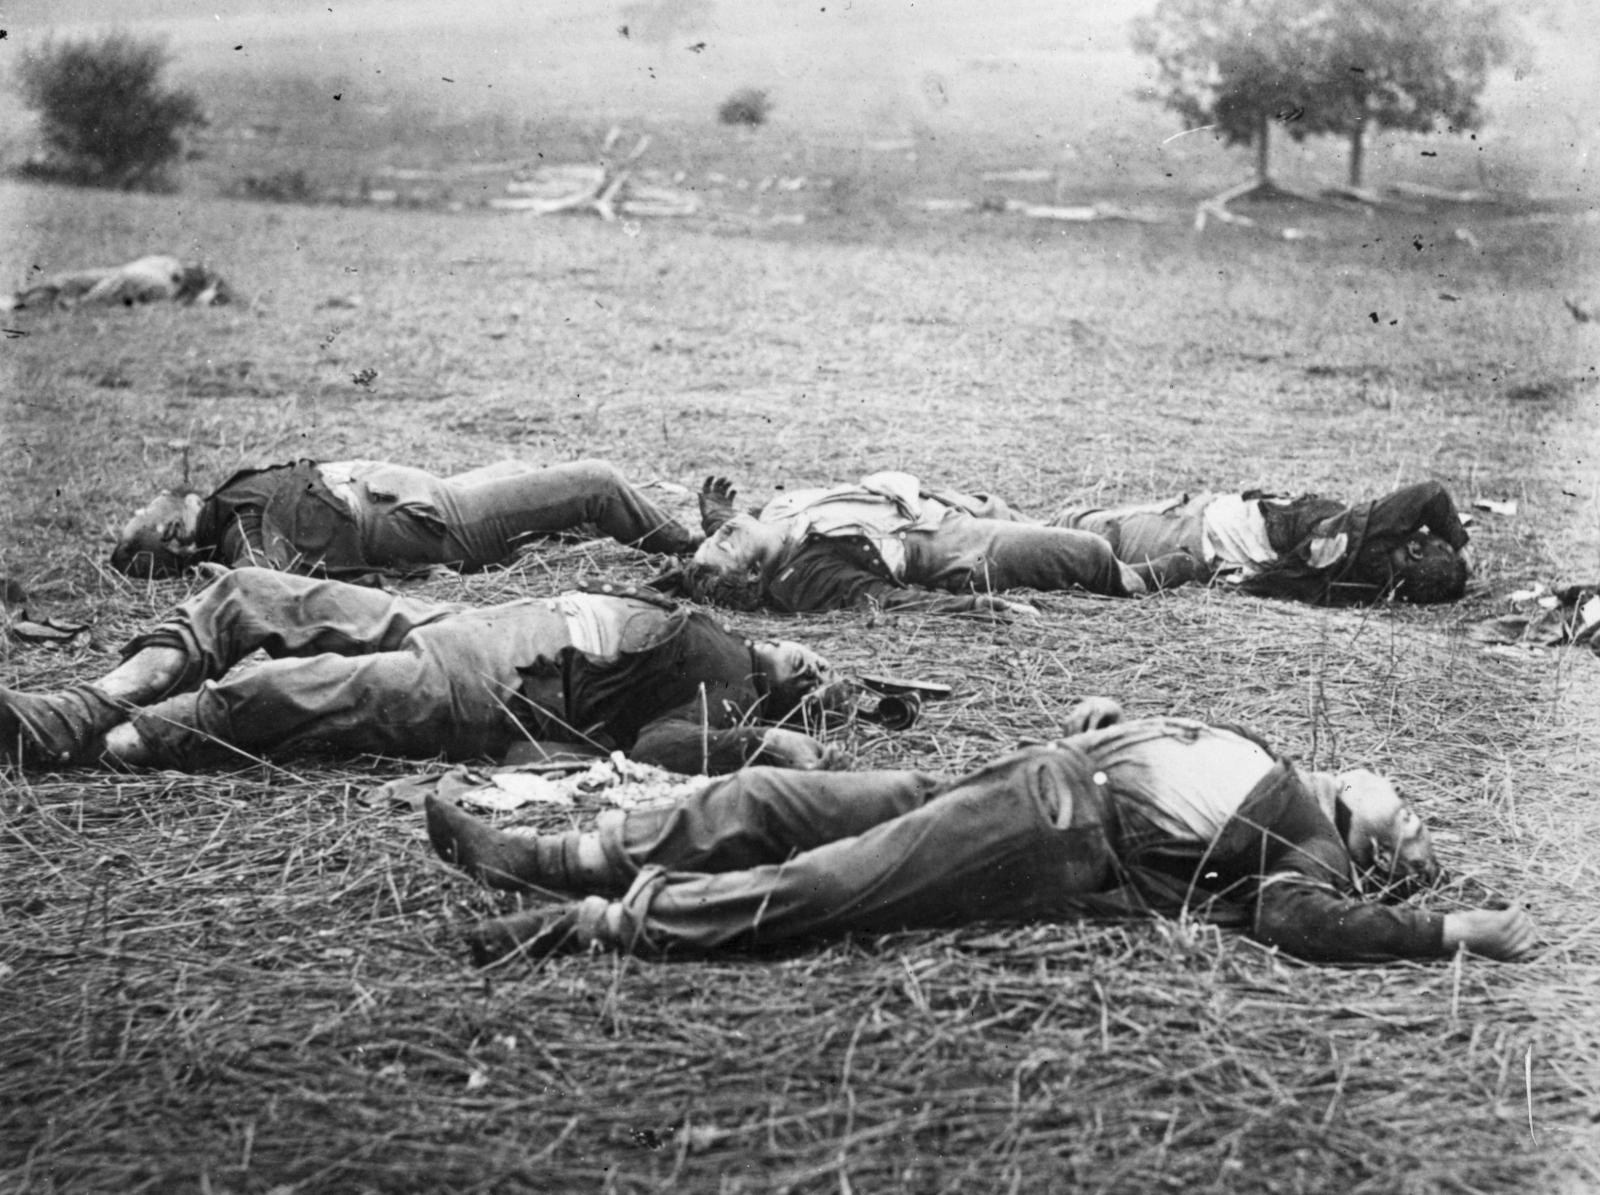 Smell of american civil war described by battle of gettysburg nurse